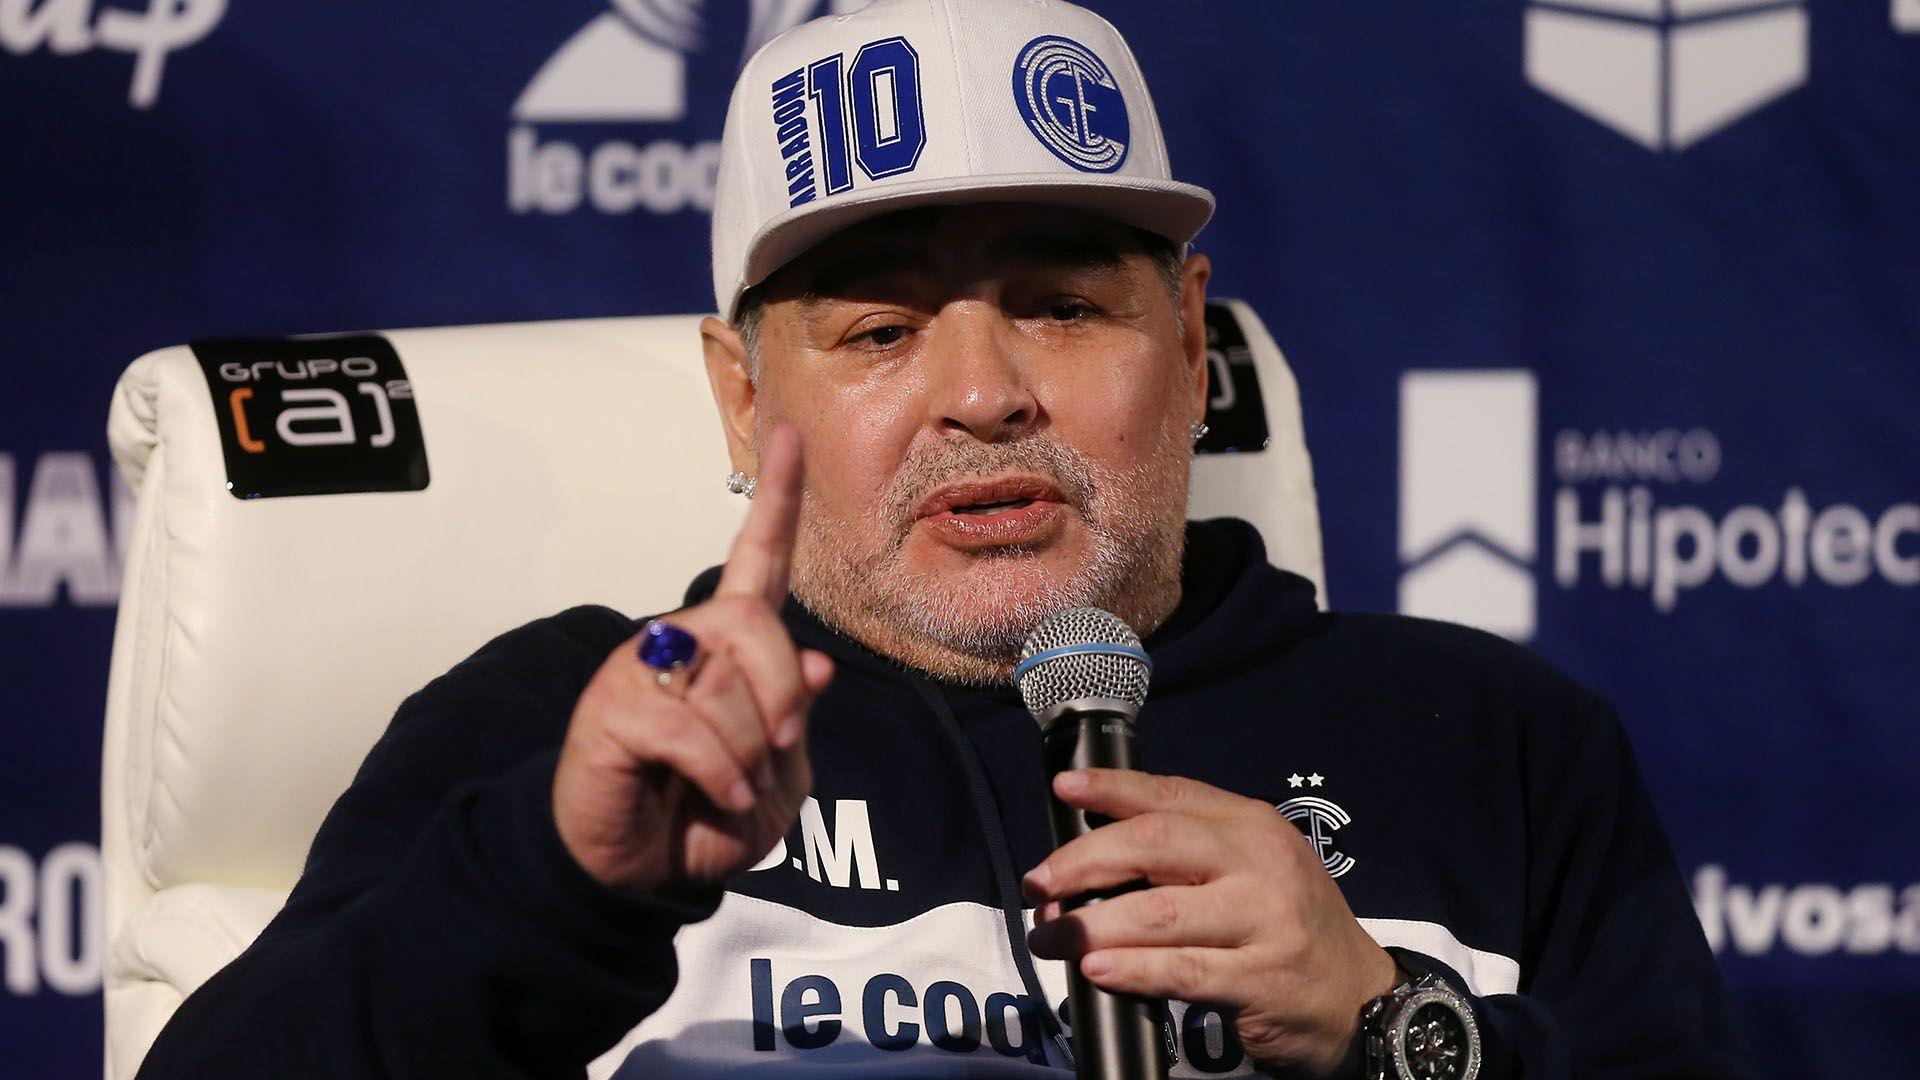 Diego Maradona (Foto: REUTERS/Agustin Marcarian)